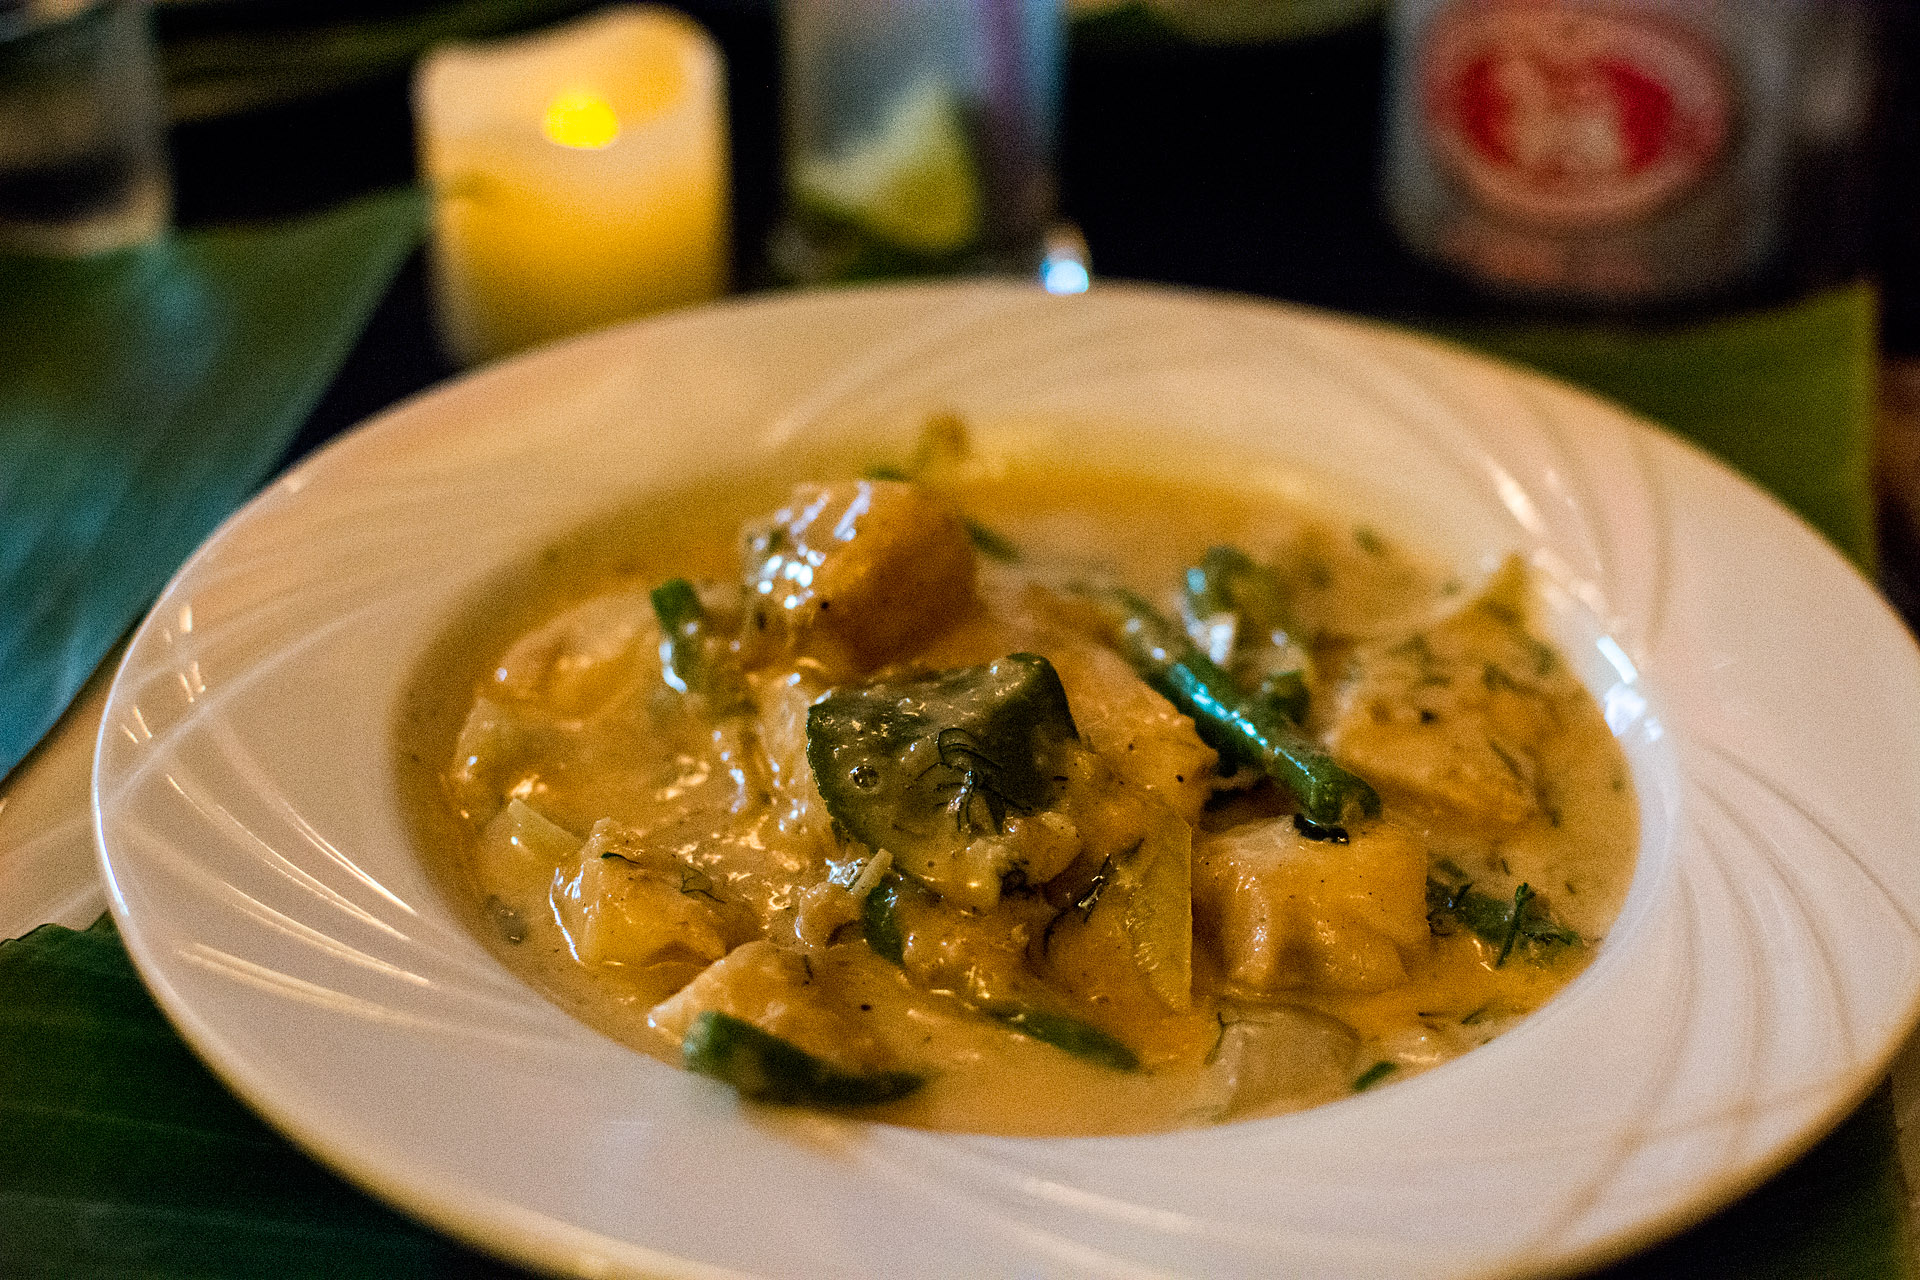 Poached catfish w/ coconut milk, basil & chili (Cafe Toui)